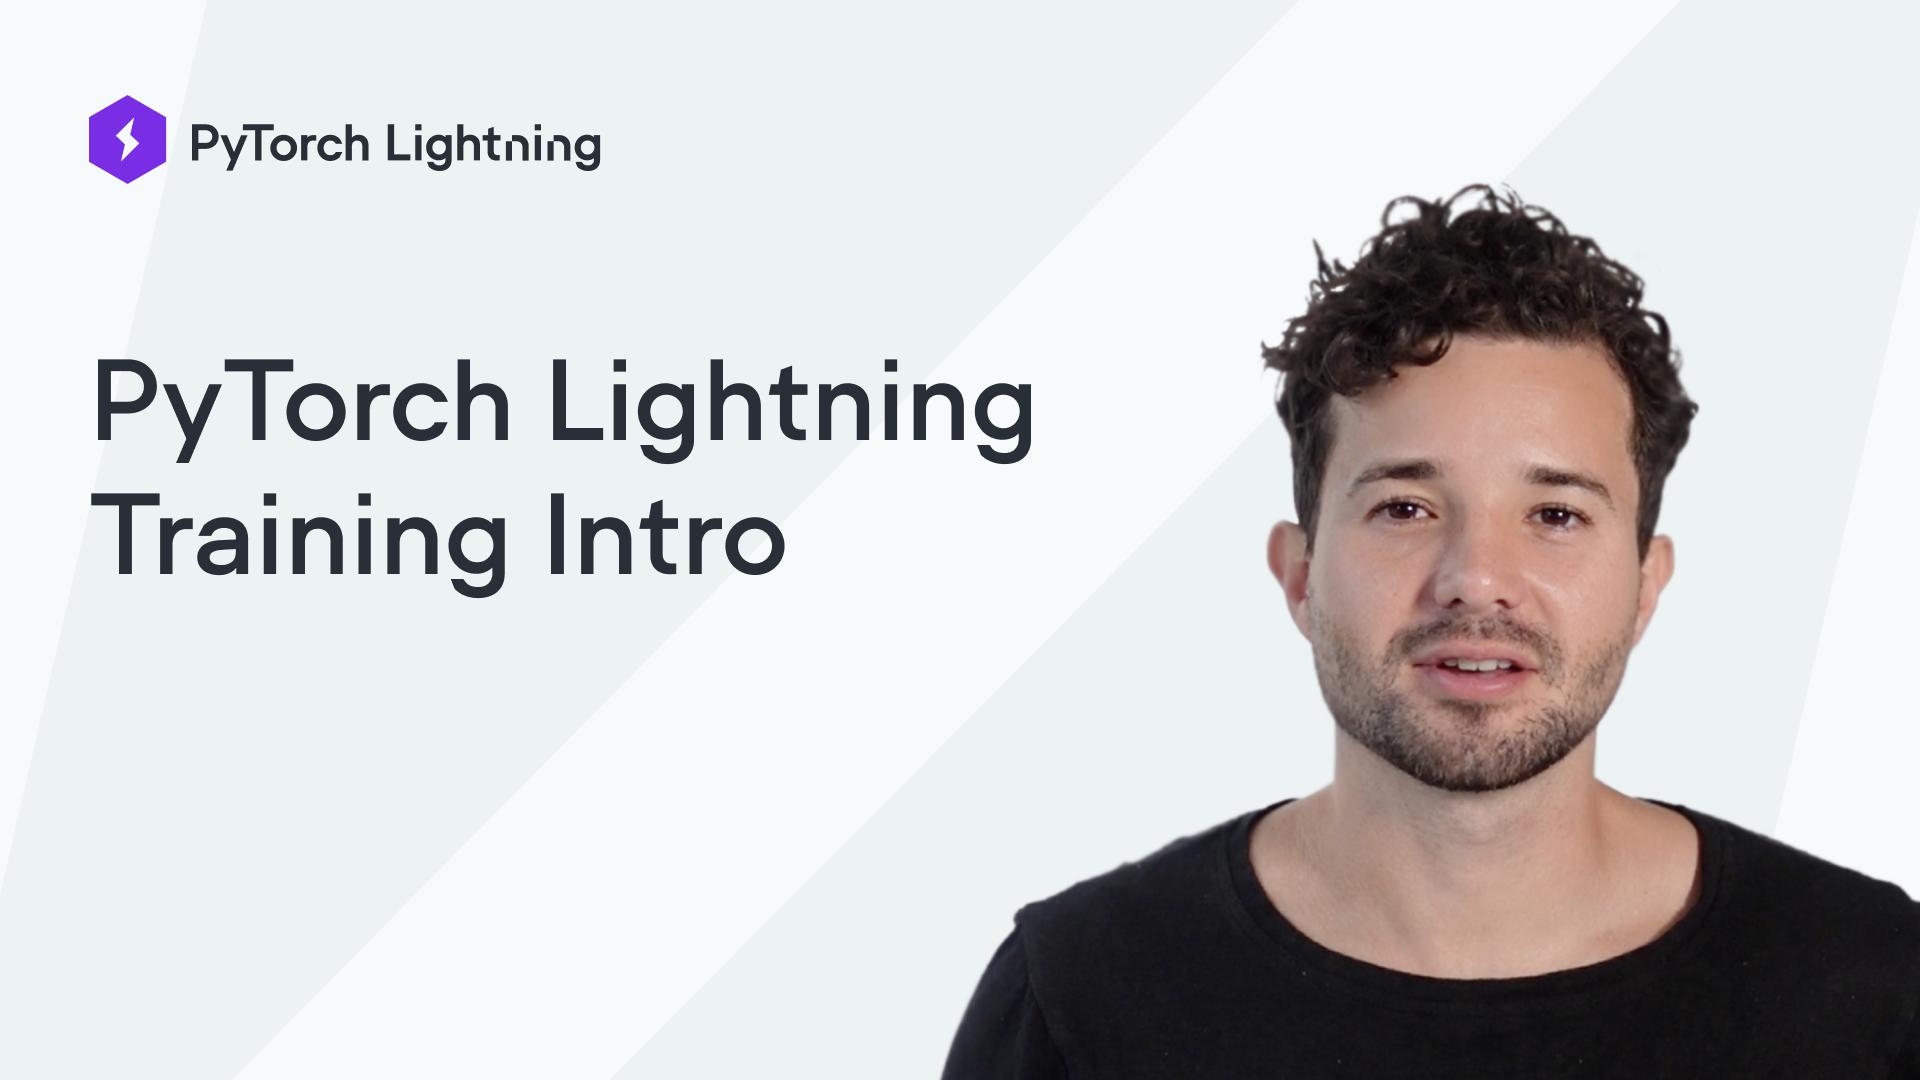 PyTorch Lightning Training Intro